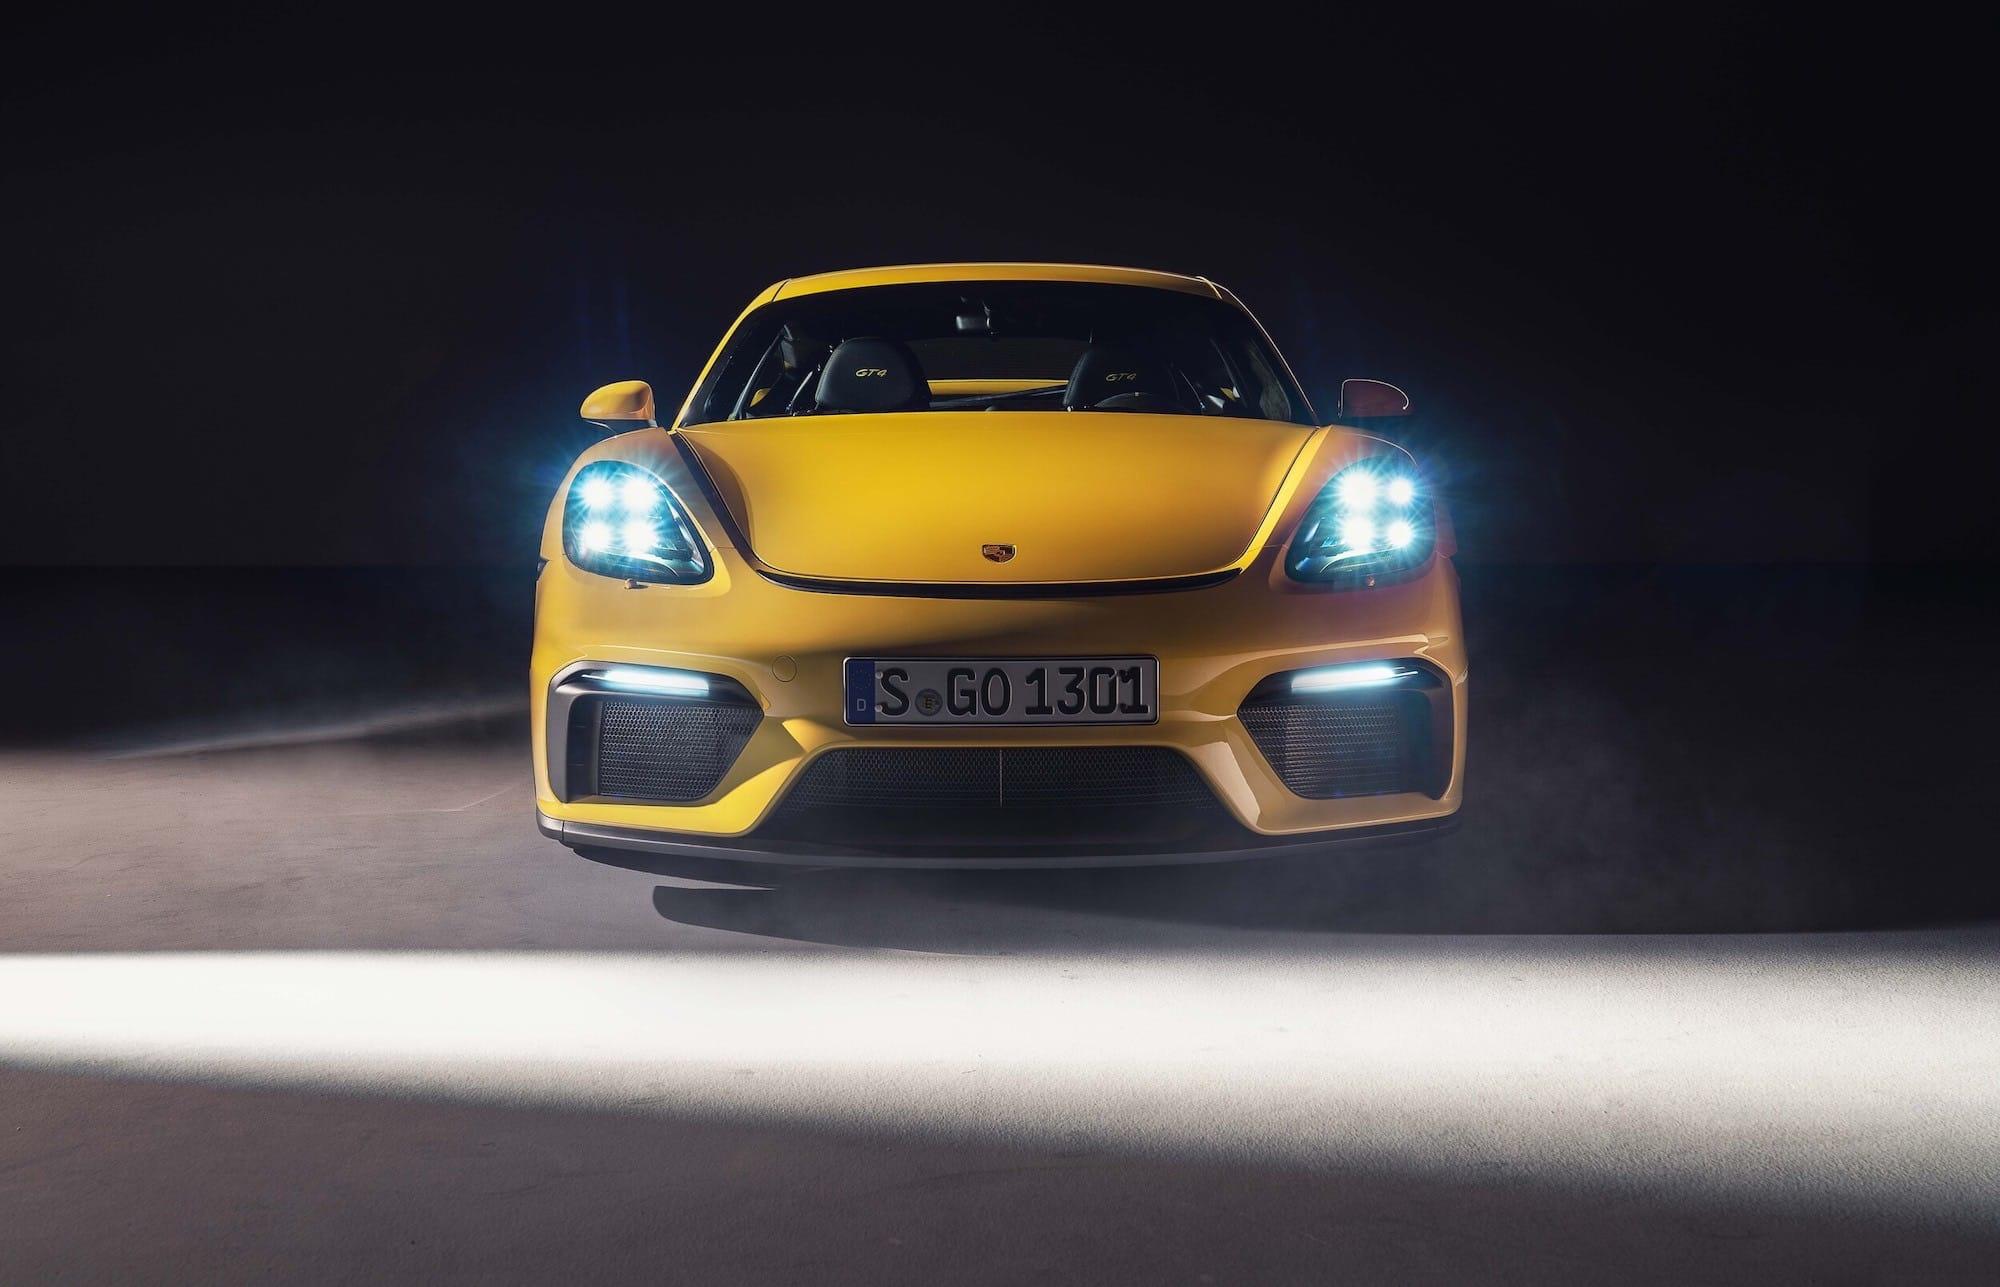 Porsche 718 Boxster >> The 2020 Porsche 718 Boxster Spyder and 718 Cayman GT4 ...